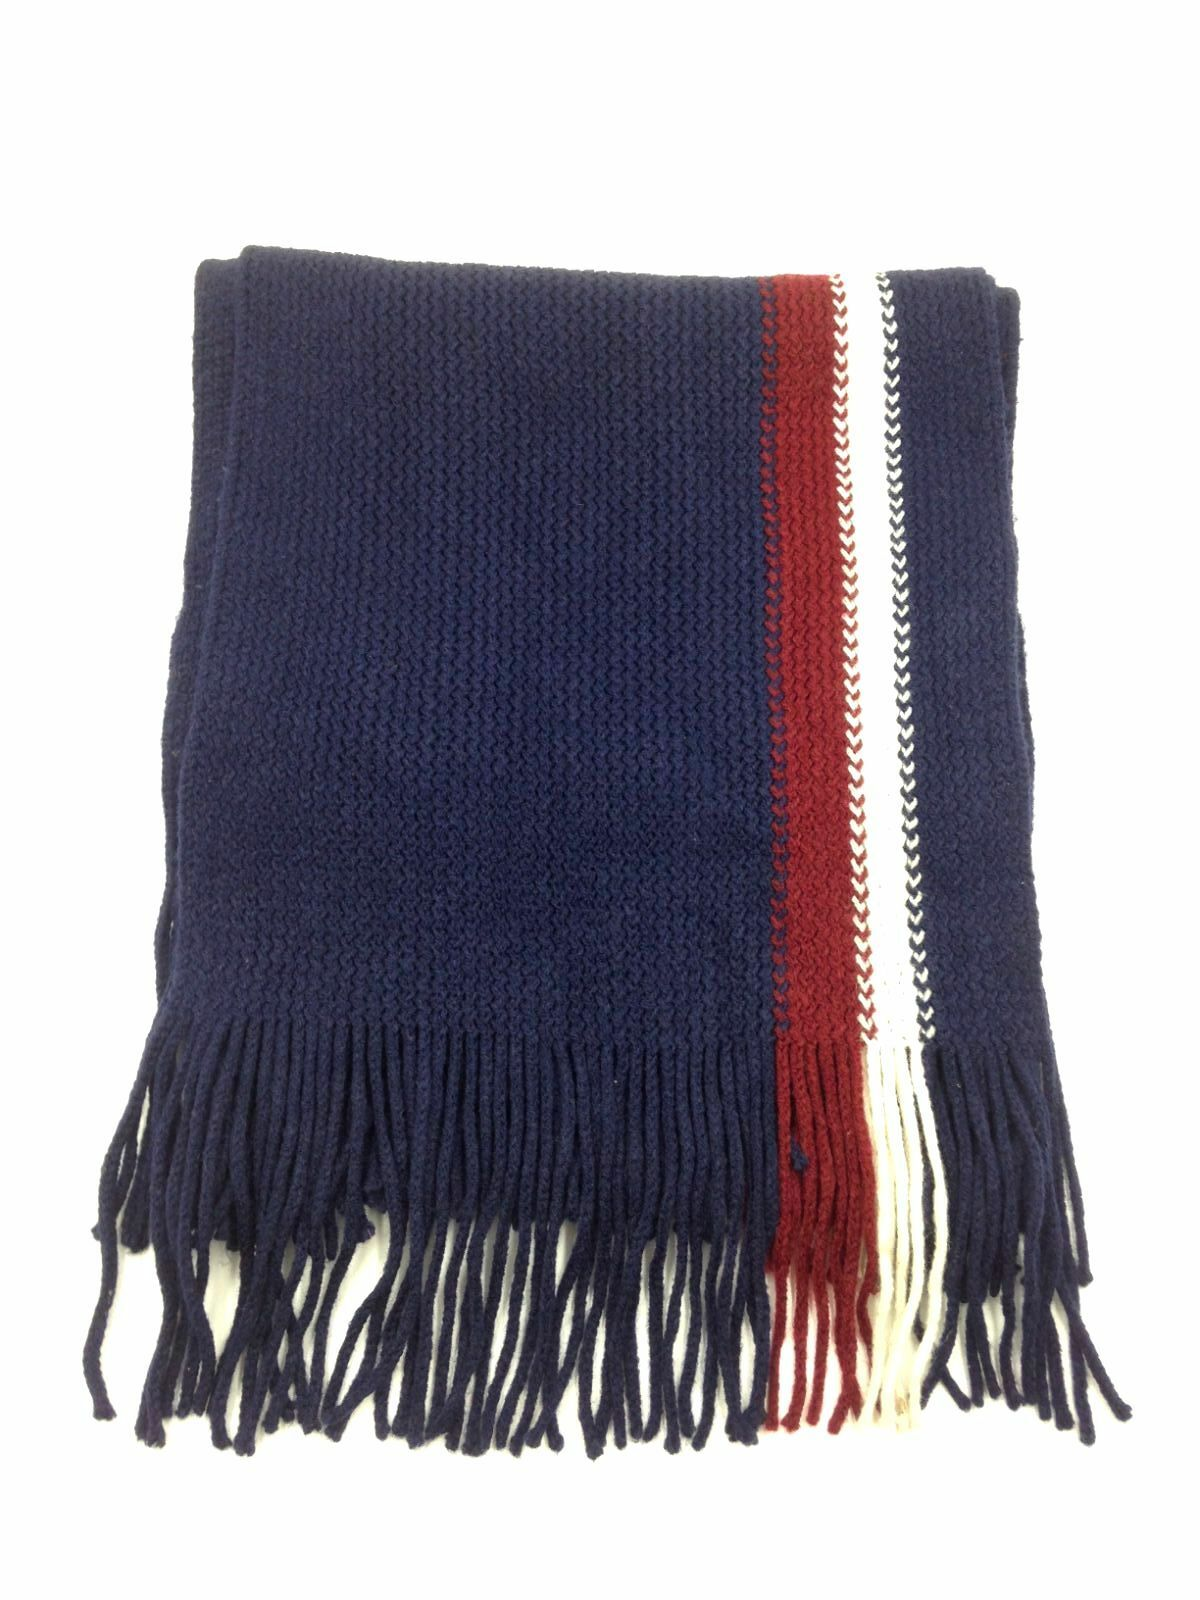 Yamalans Men/'s Classic Acrylic Shawl Winter Warm Long Fringe Striped Tassel Scarf